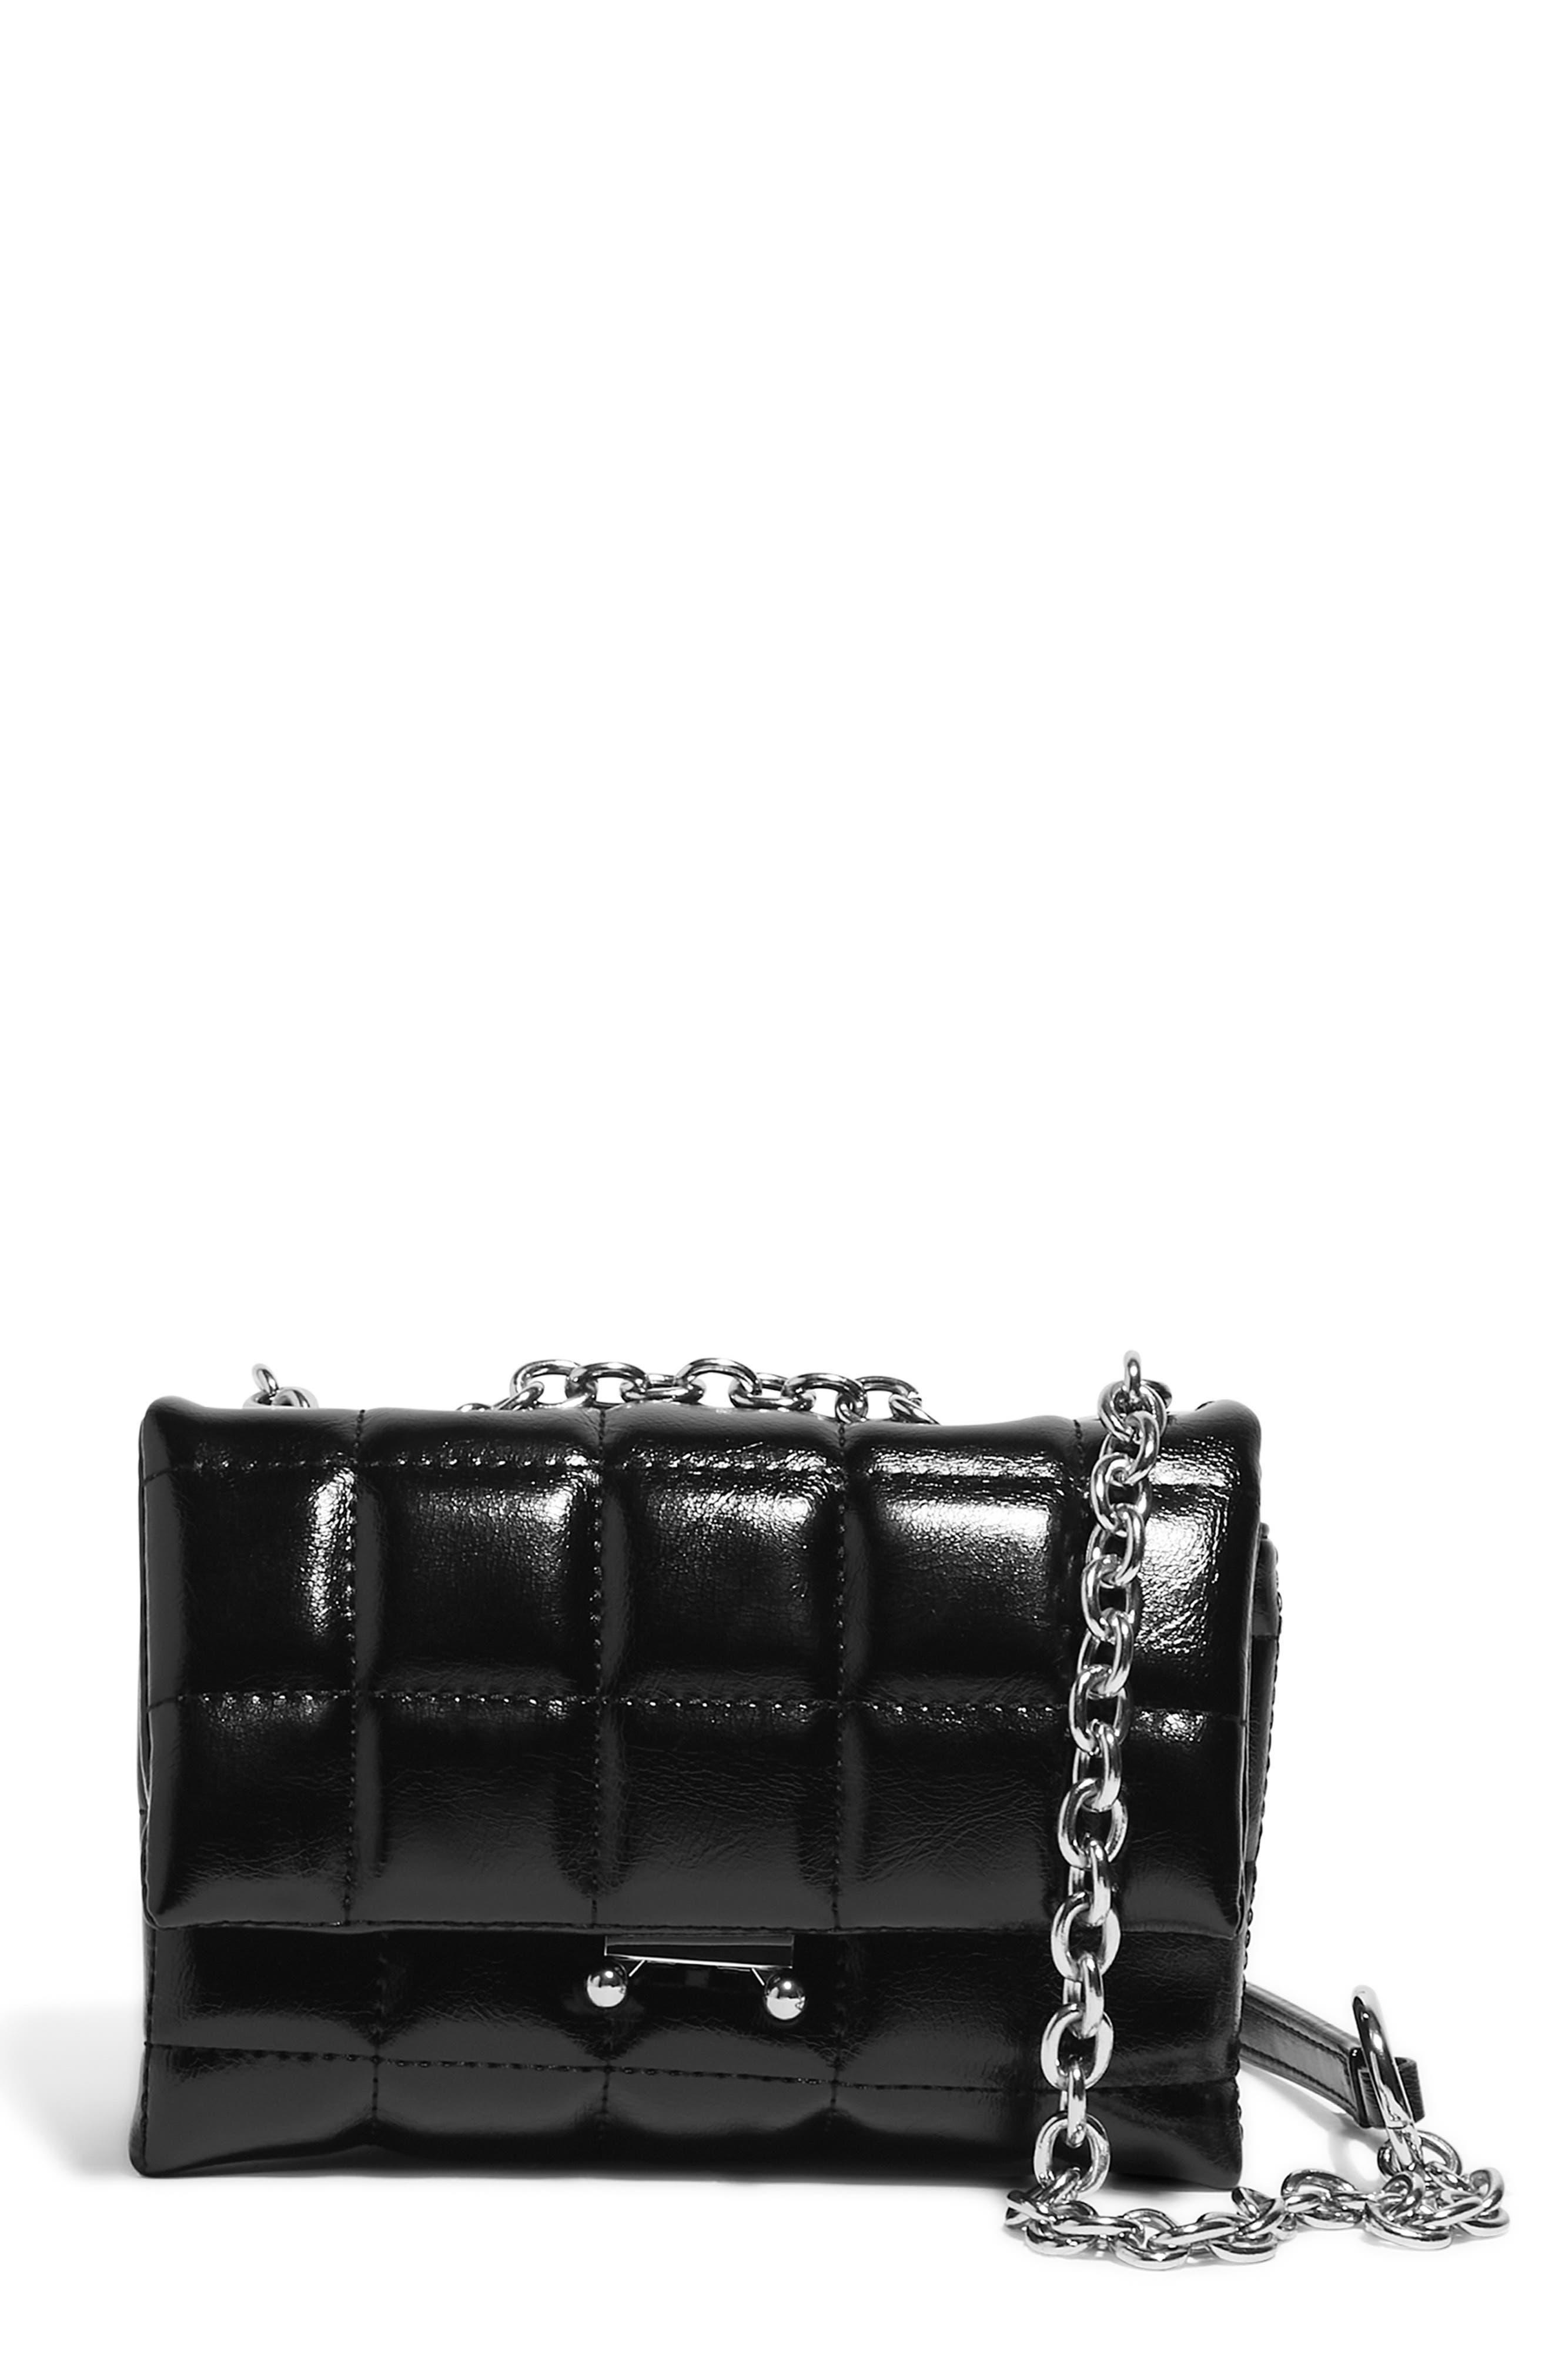 Small How We Slay Vegan Leather Shoulder Bag